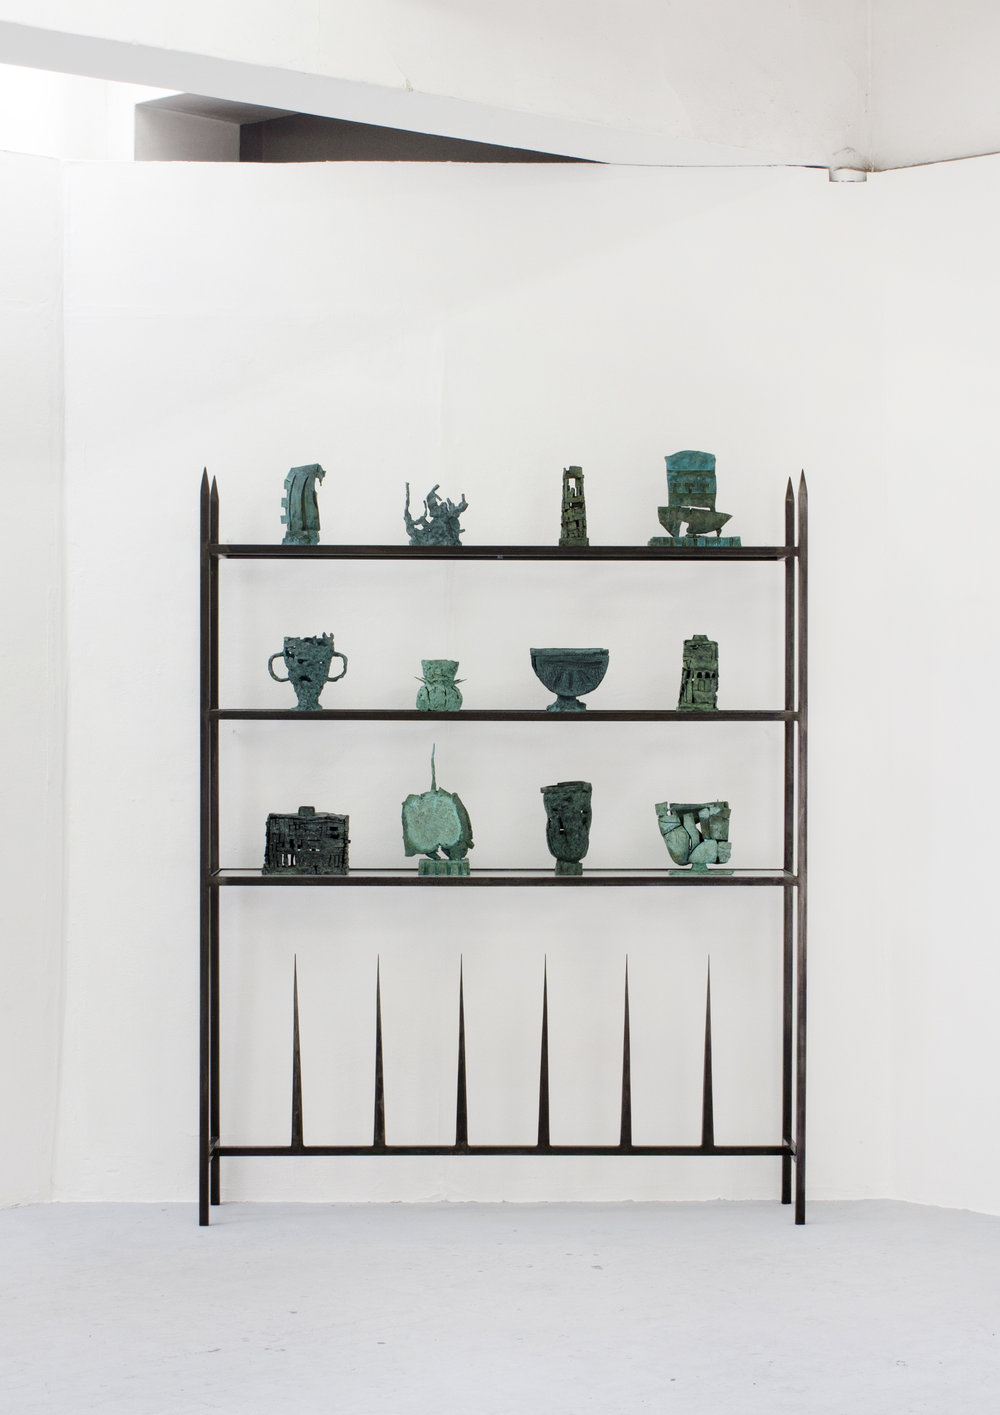 'Emulation; Ruins, Vases & Fragments' - Bronze, steel, glass & rubber - 205.5 x 160 x 35 cm - 2018